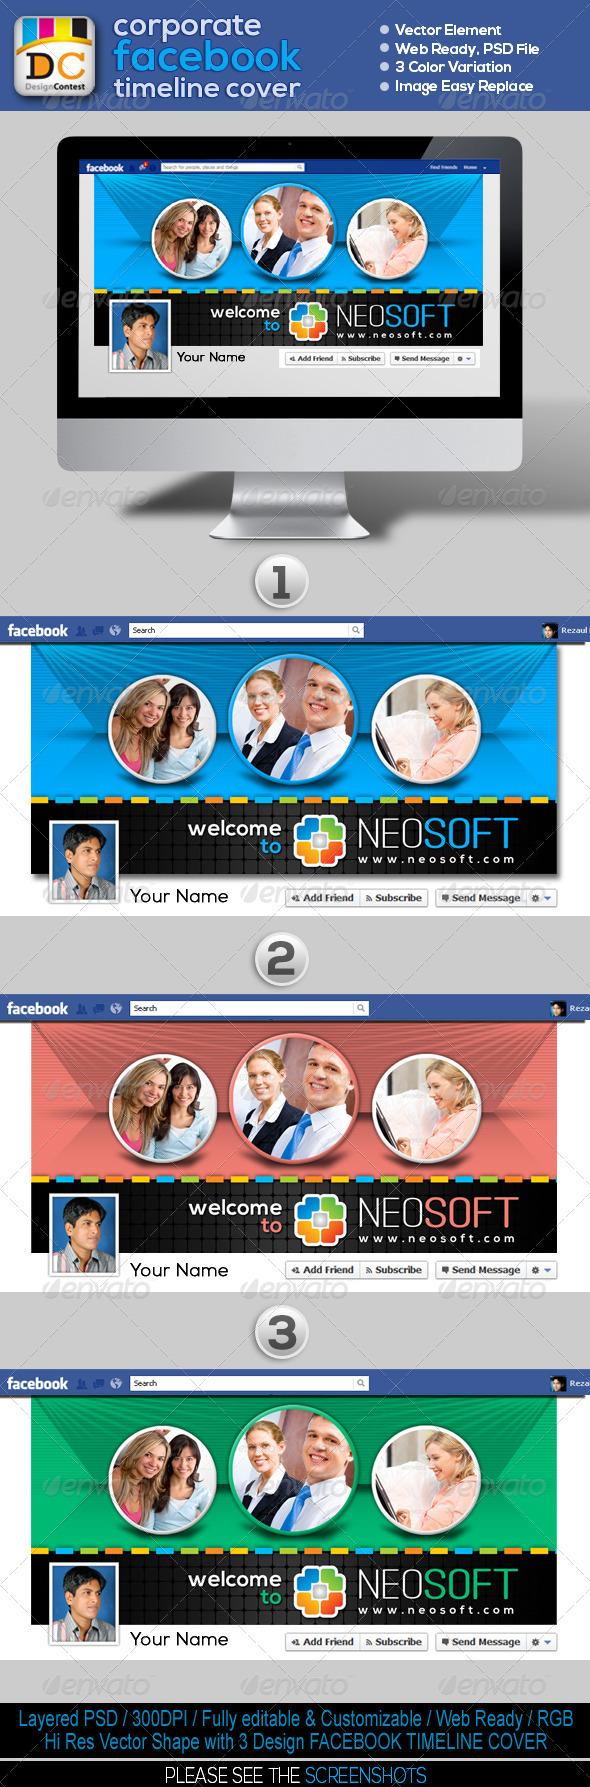 NeoSoft_Corporate FB Timeline Cover - Facebook Timeline Covers Social Media